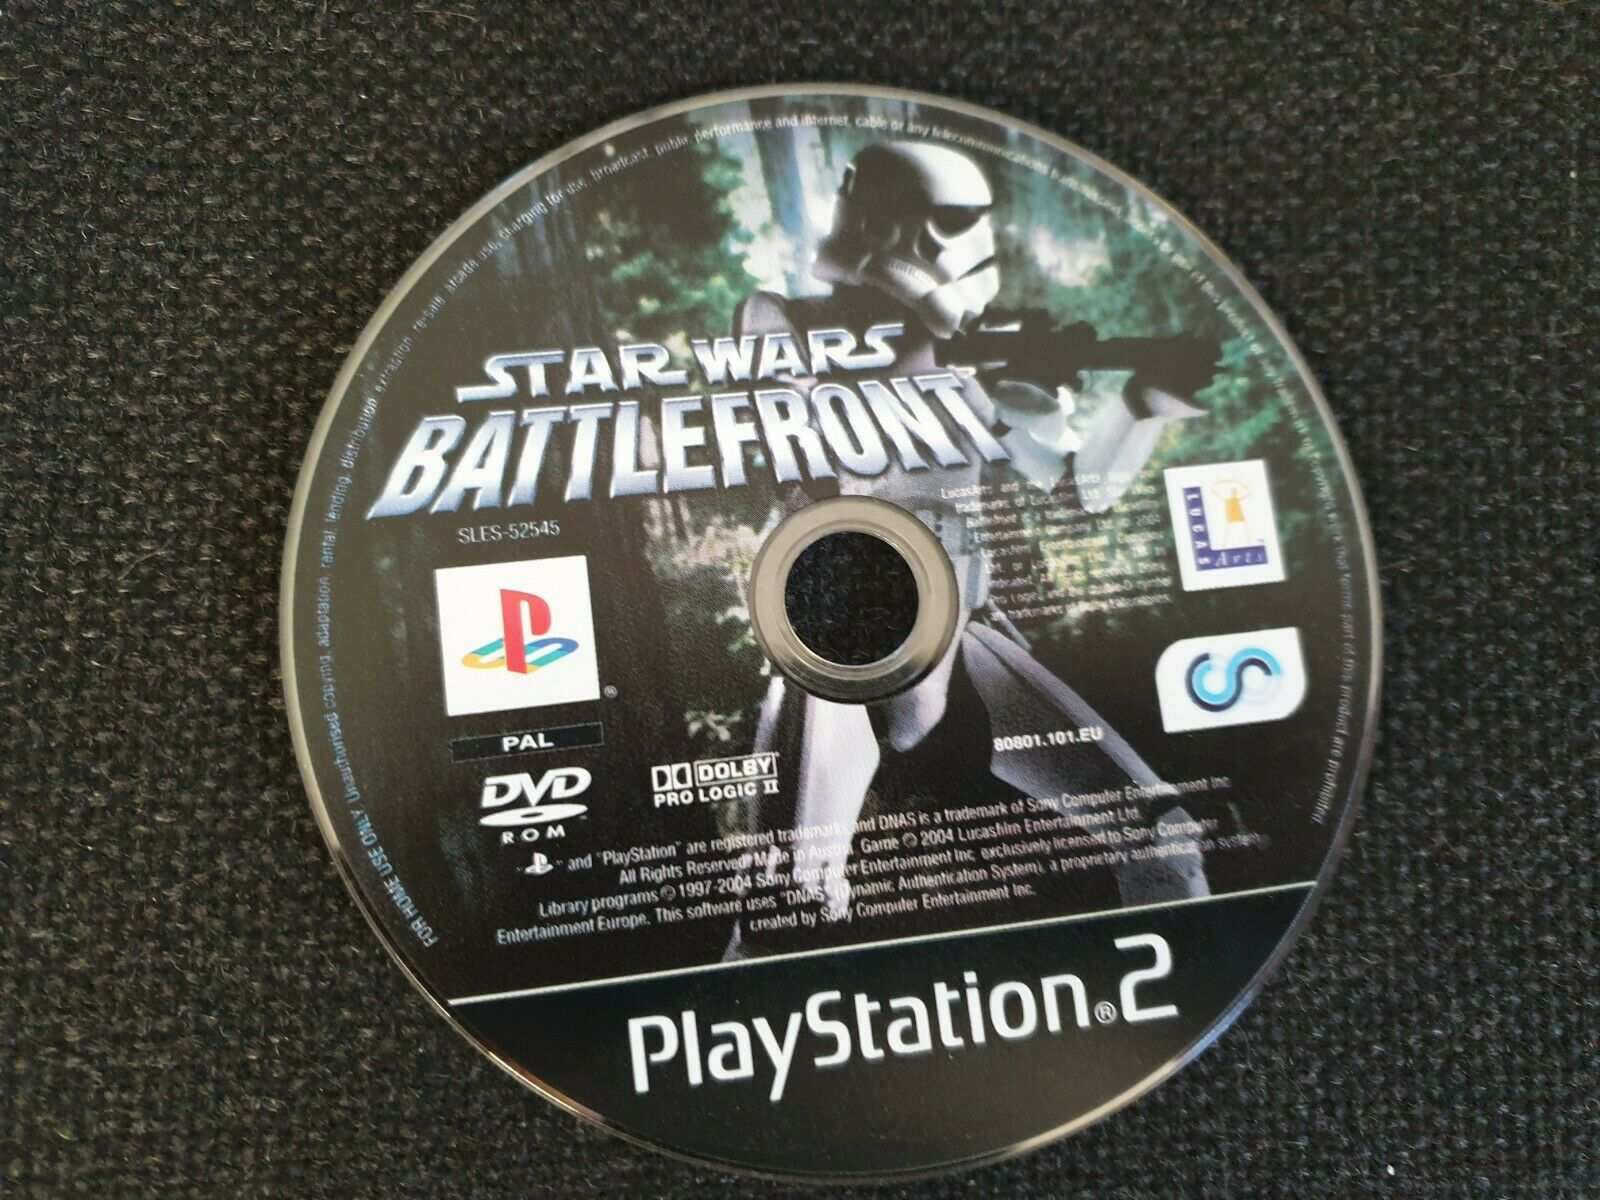 Star Wars: Battlefront, Sony Playstation 2 - Occasion StarWars